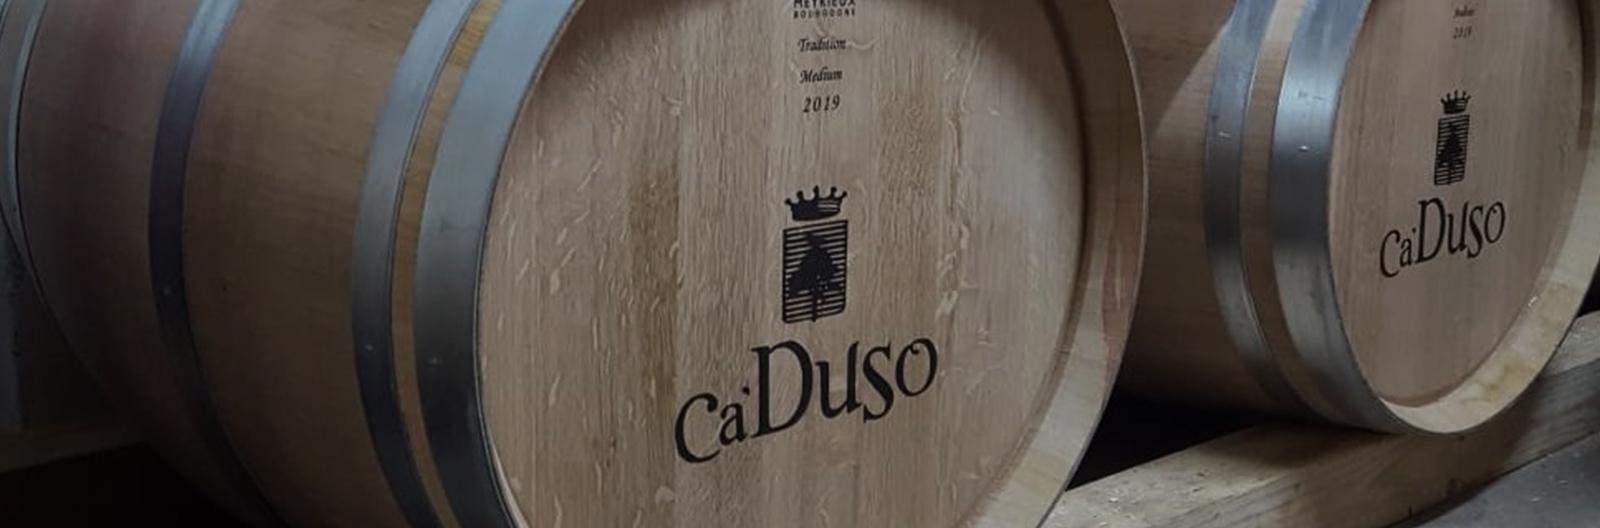 Ca' Duso